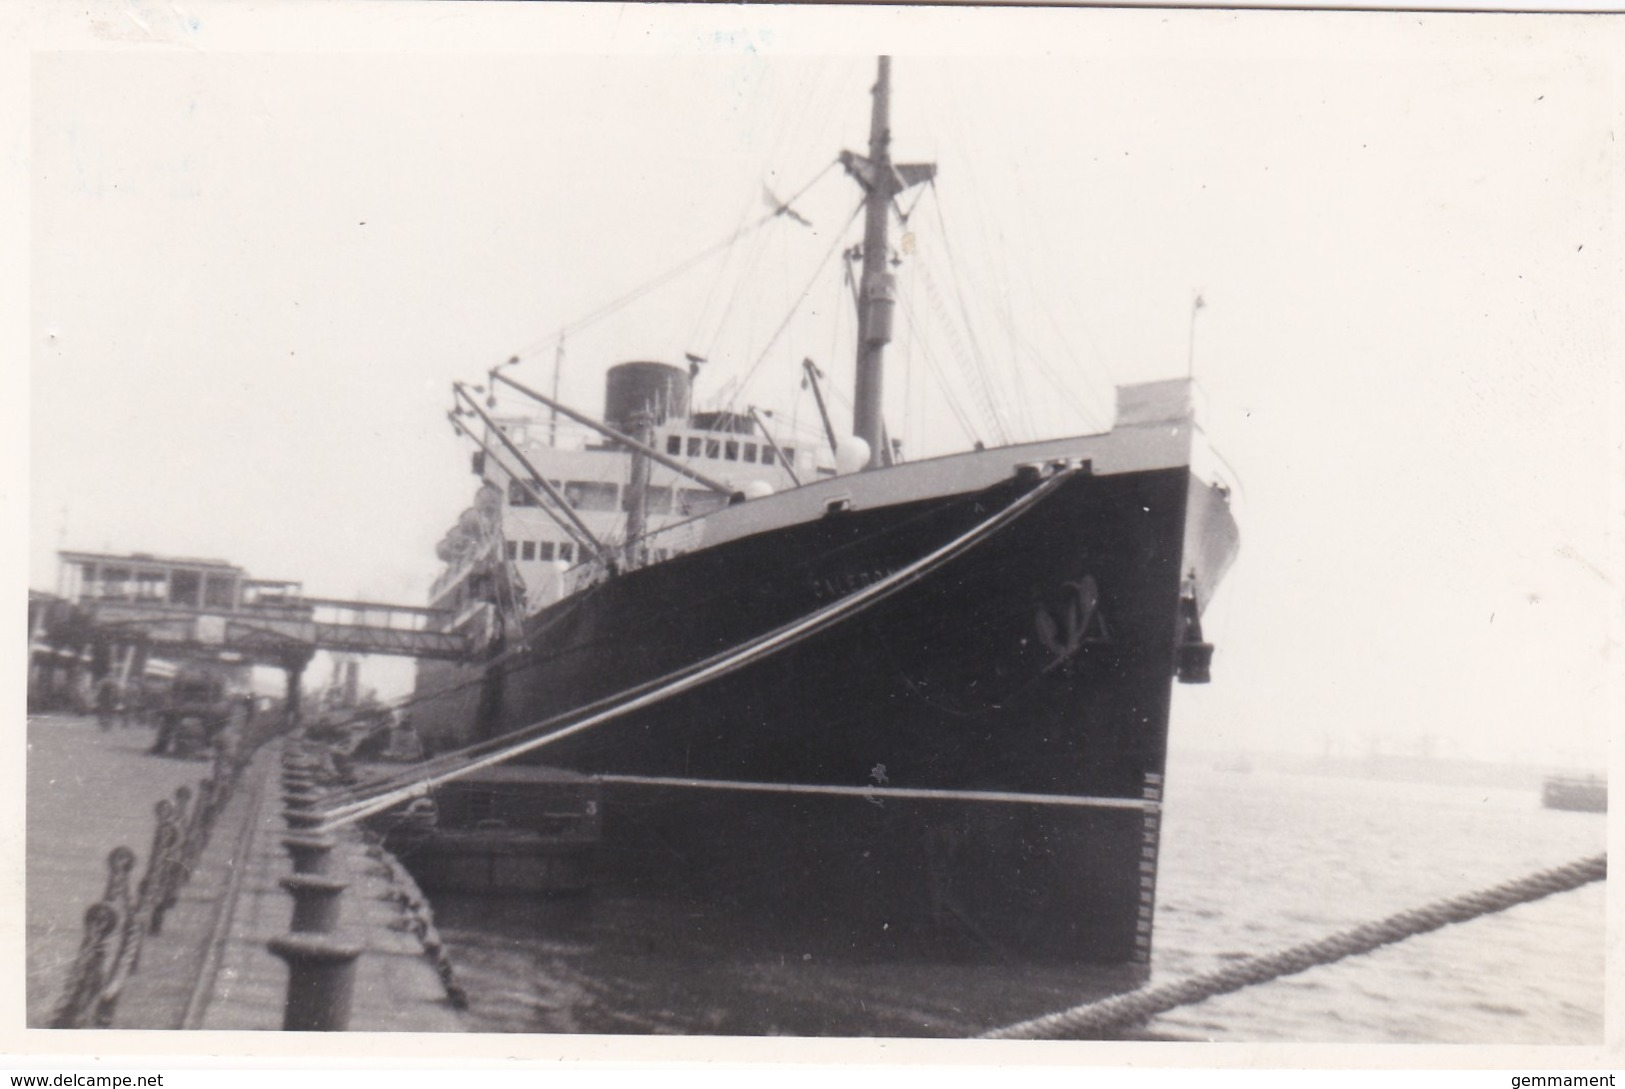 CALEDONIA. LIVERPOOL 1956 - Paquebote